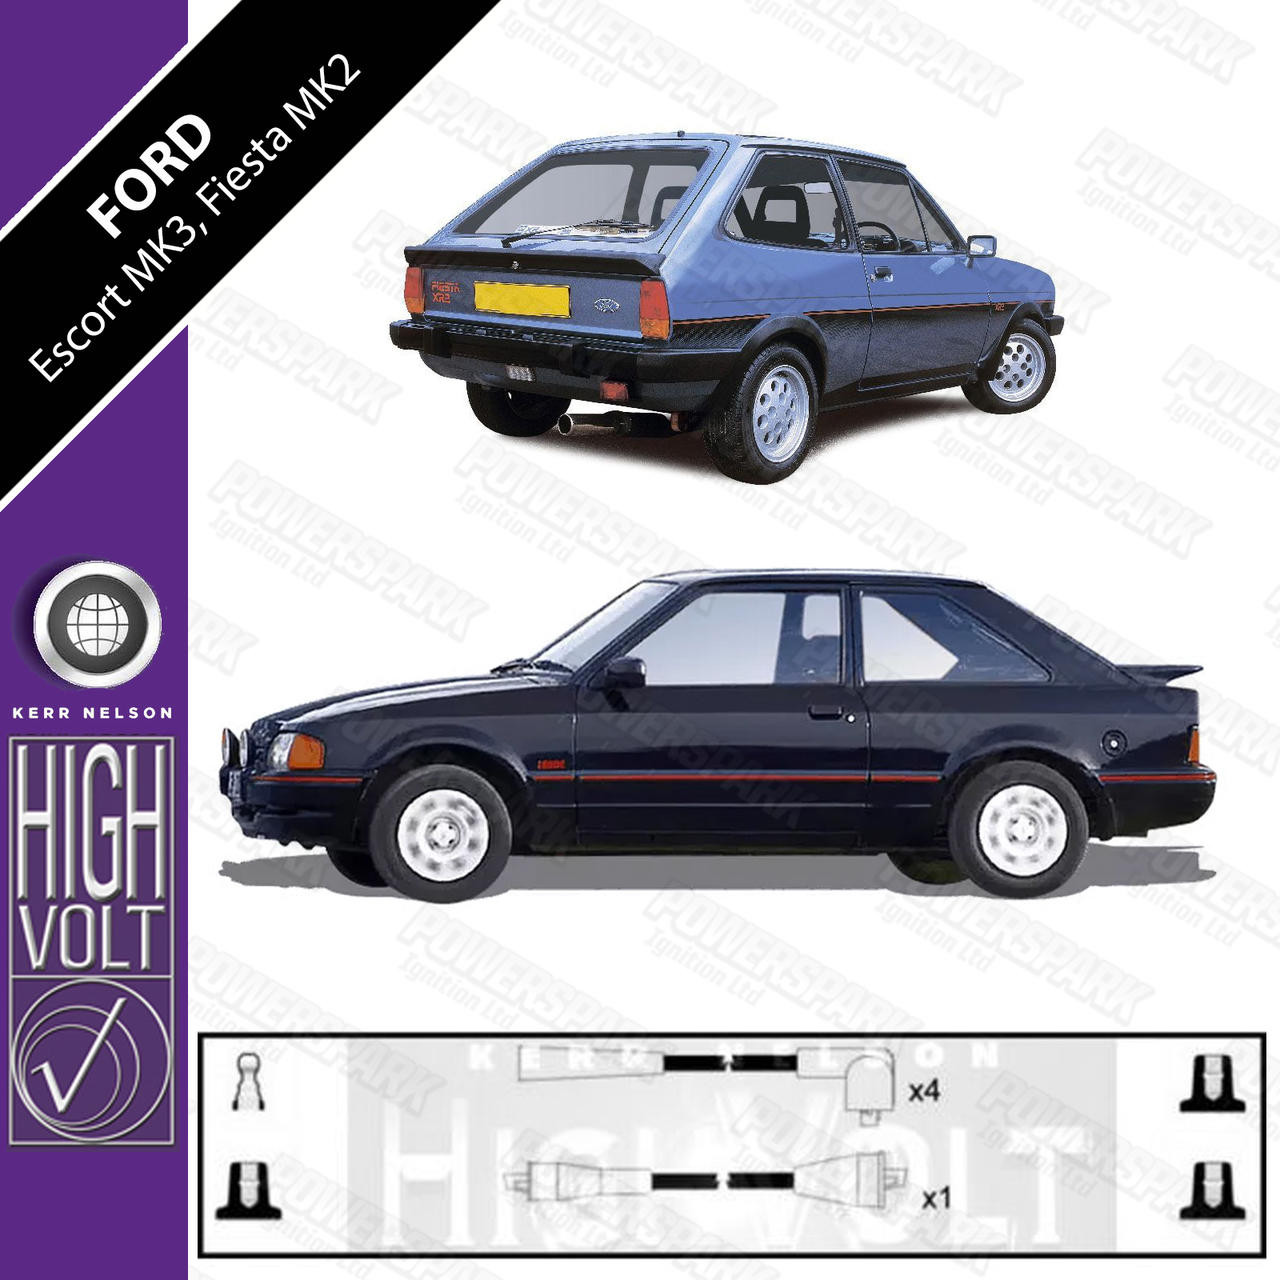 High Volt Ford Escort Mk3 and Fiesta Mk2 incl XR3i and XR2i High Volt HT Leads OEF145